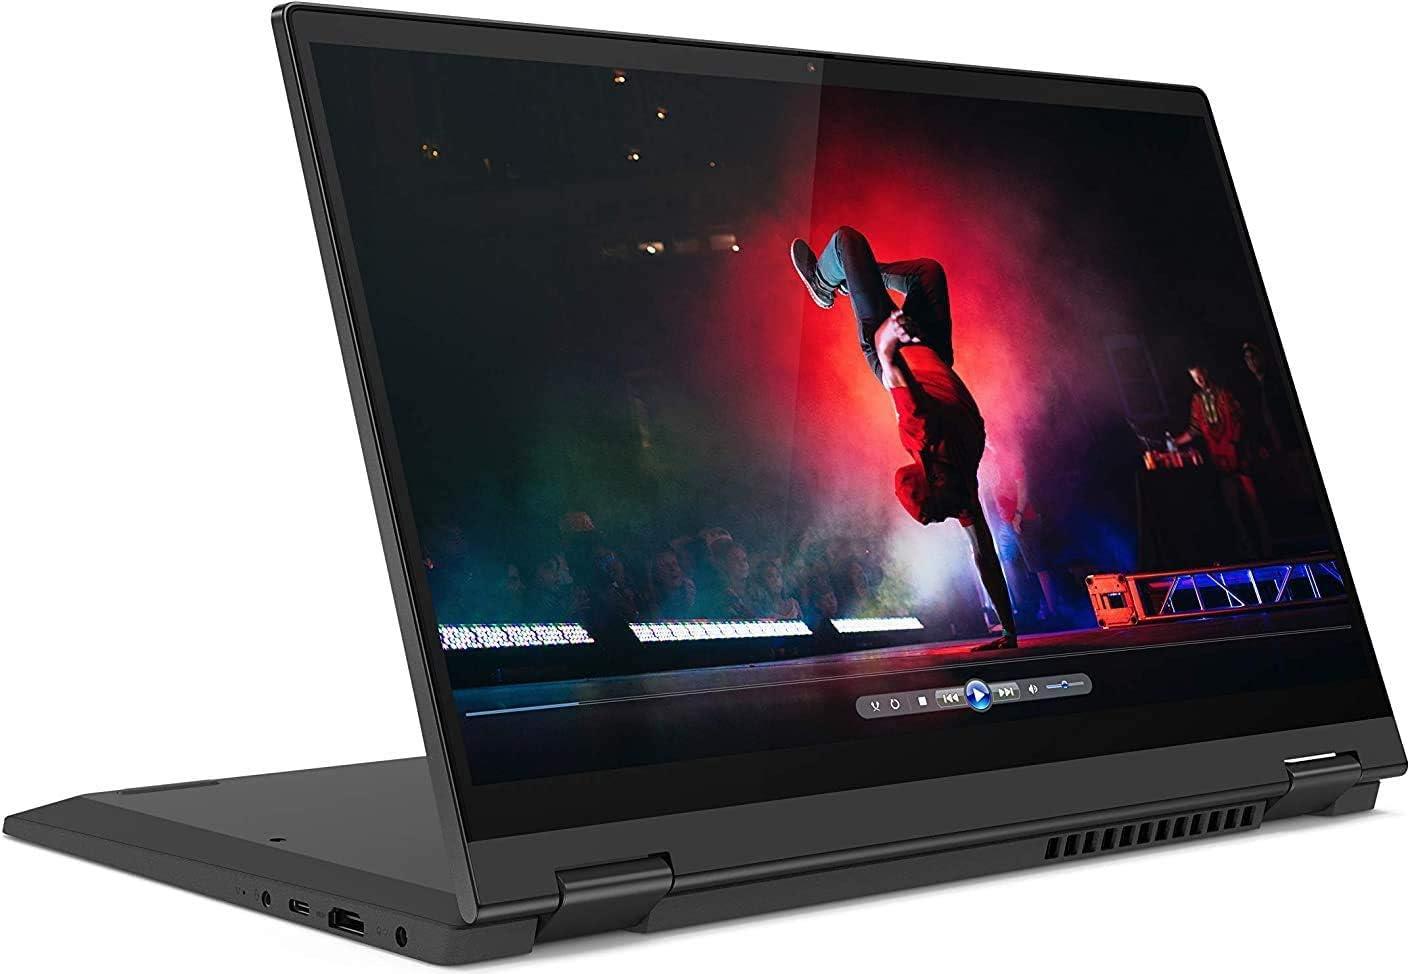 Lenovo IdeaPad Flex 5 2-in-1 Laptop, 14